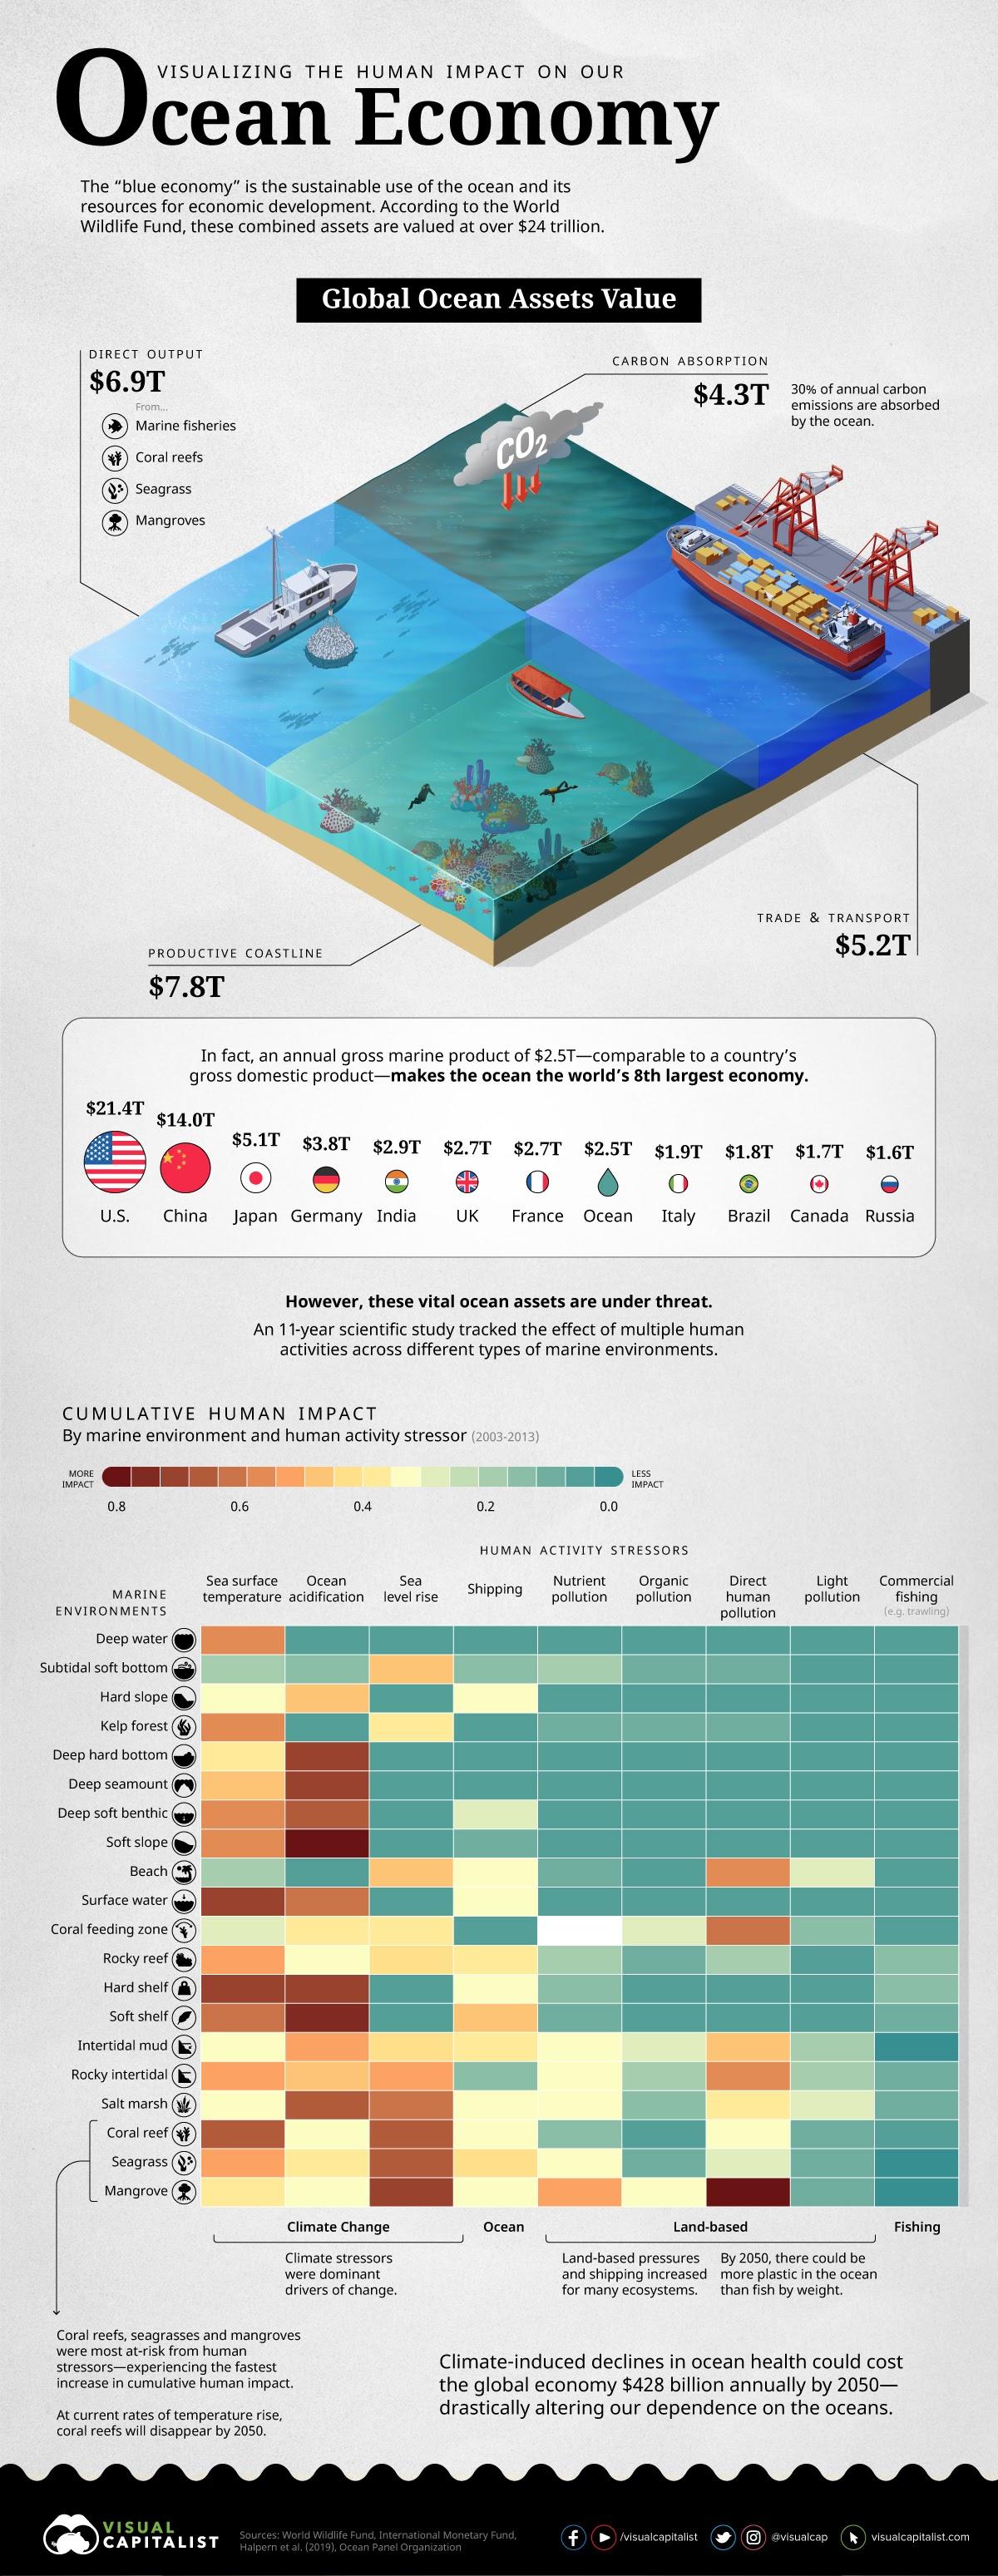 Visualisation of the Ocean Economy Human Impact #infographic #Economy #Ocean Enviroment